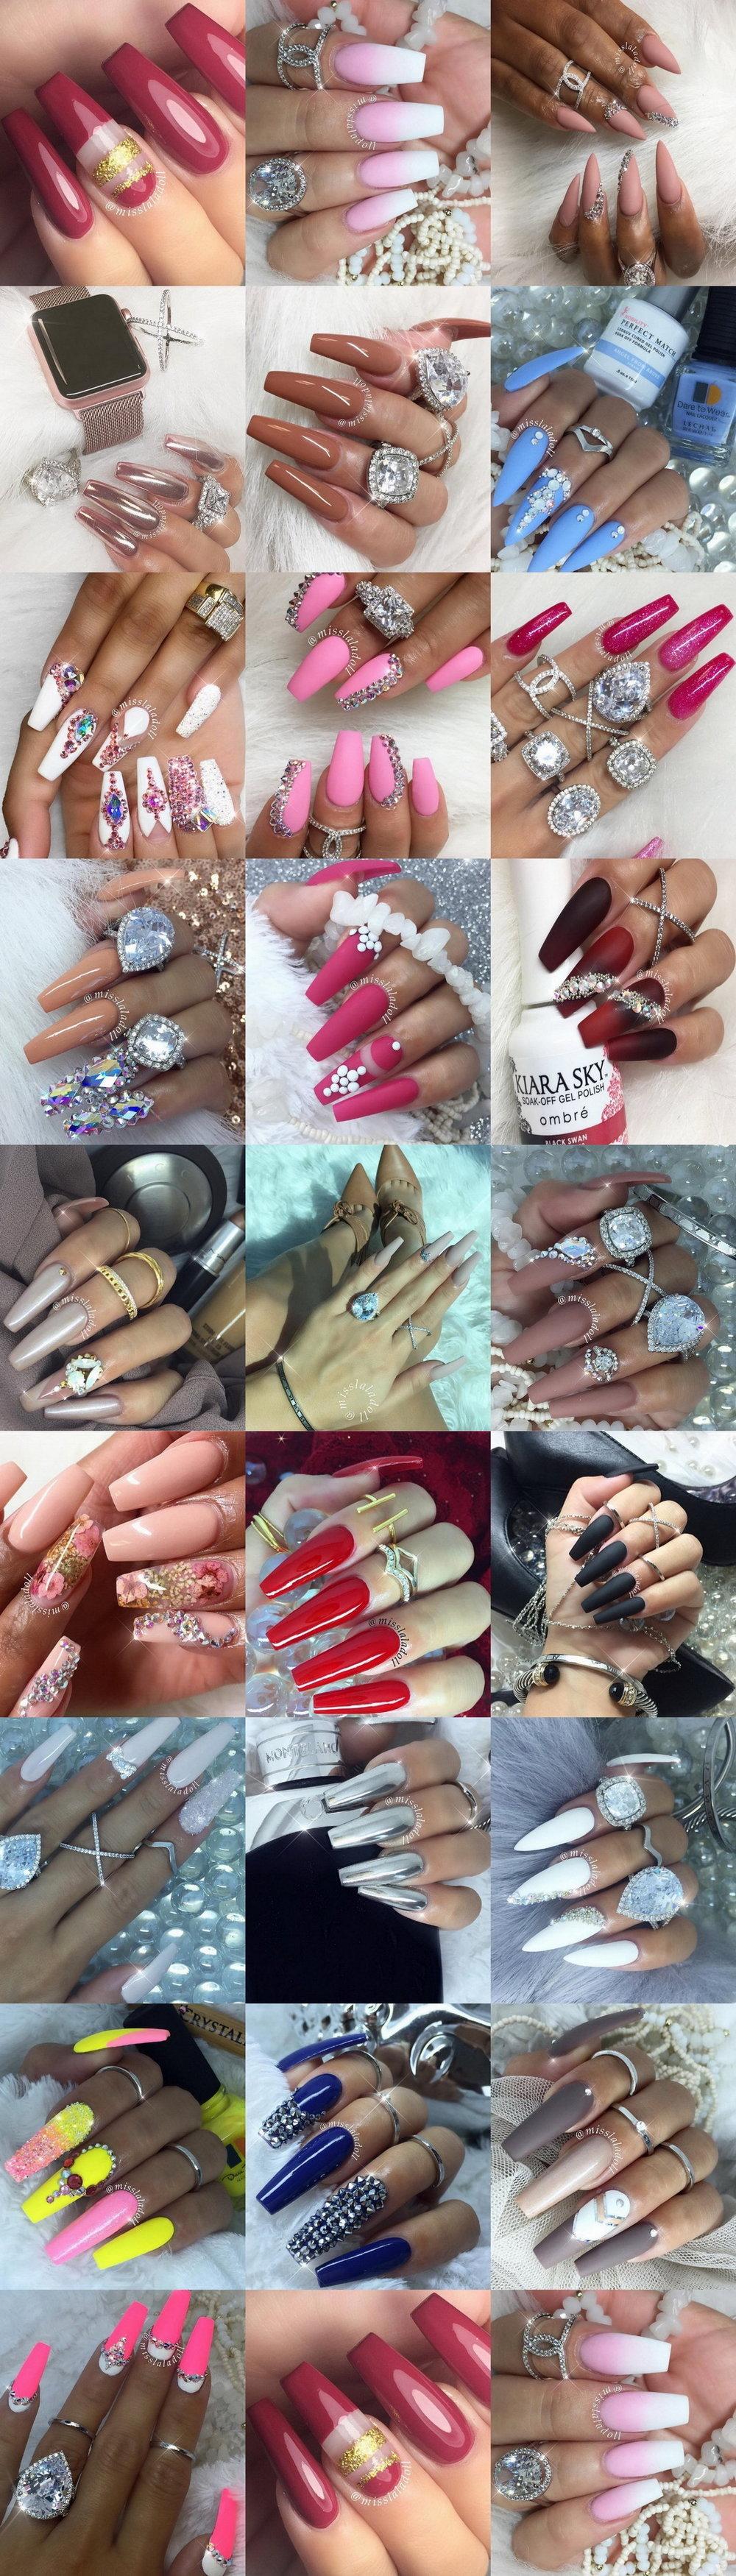 💅🏻 25 Trend-Setting Nail Art Designs @misslaladoll